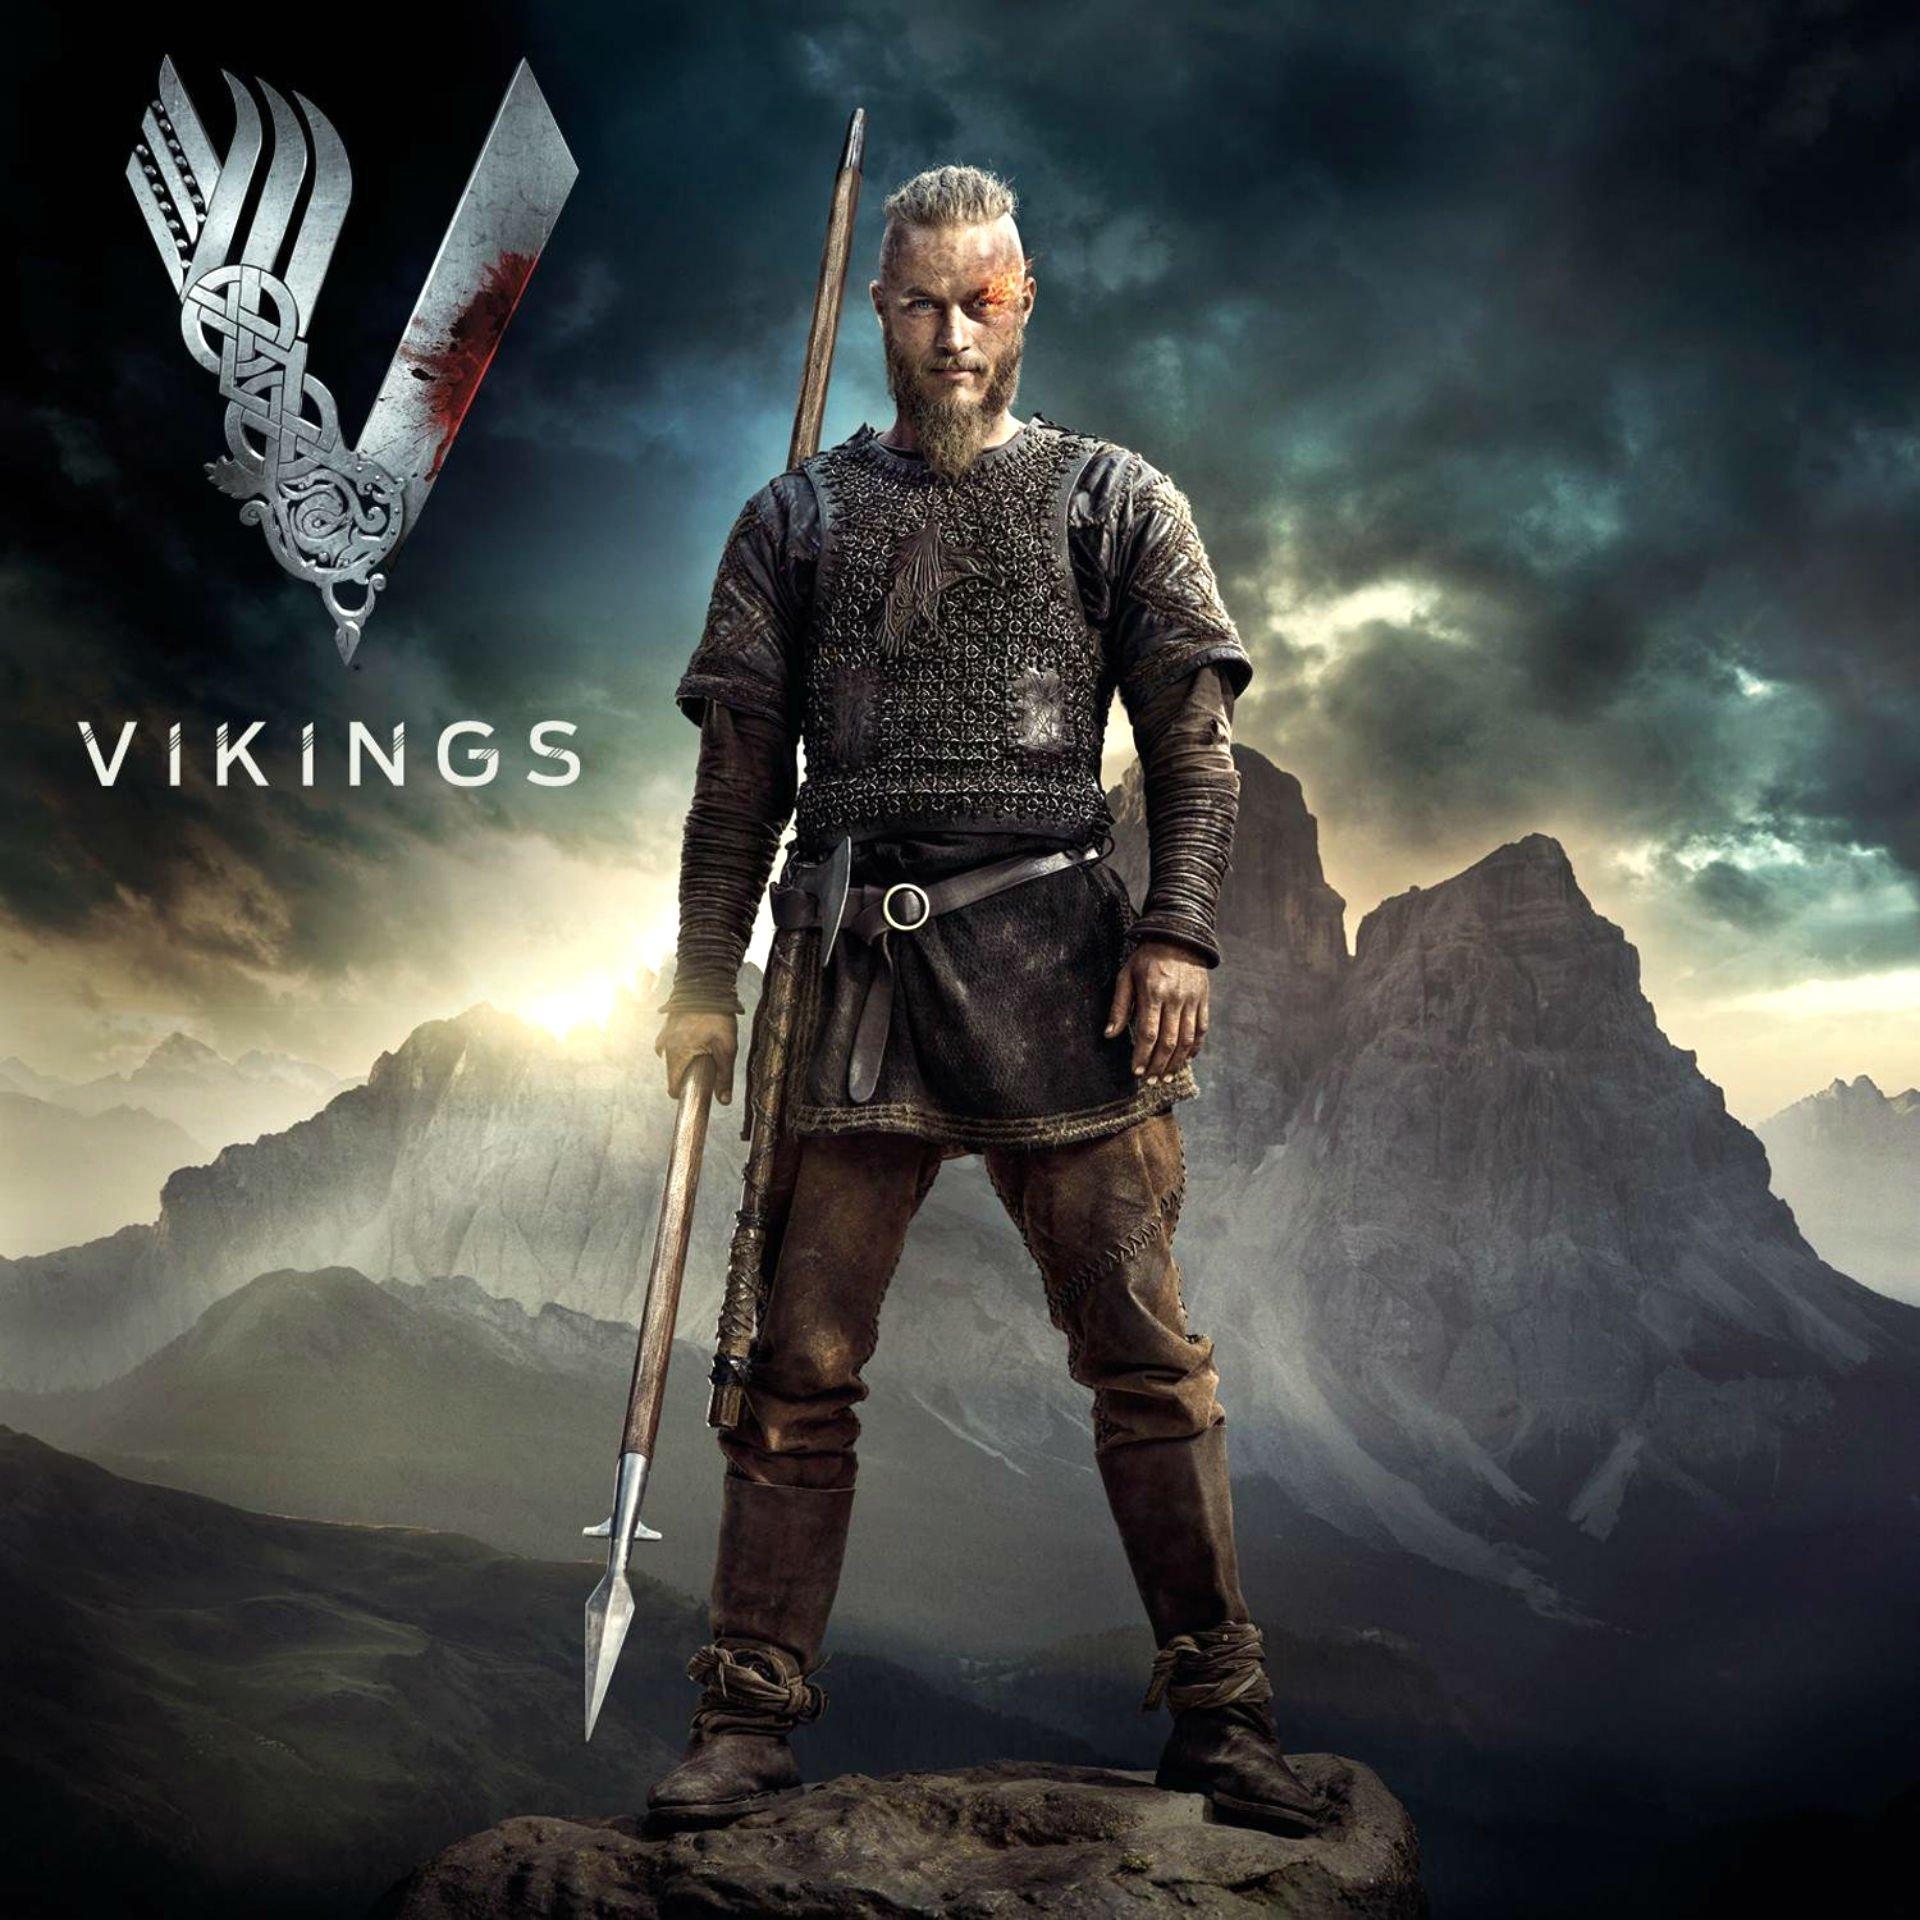 VIKINGS action drama history fantasy adventure series ...